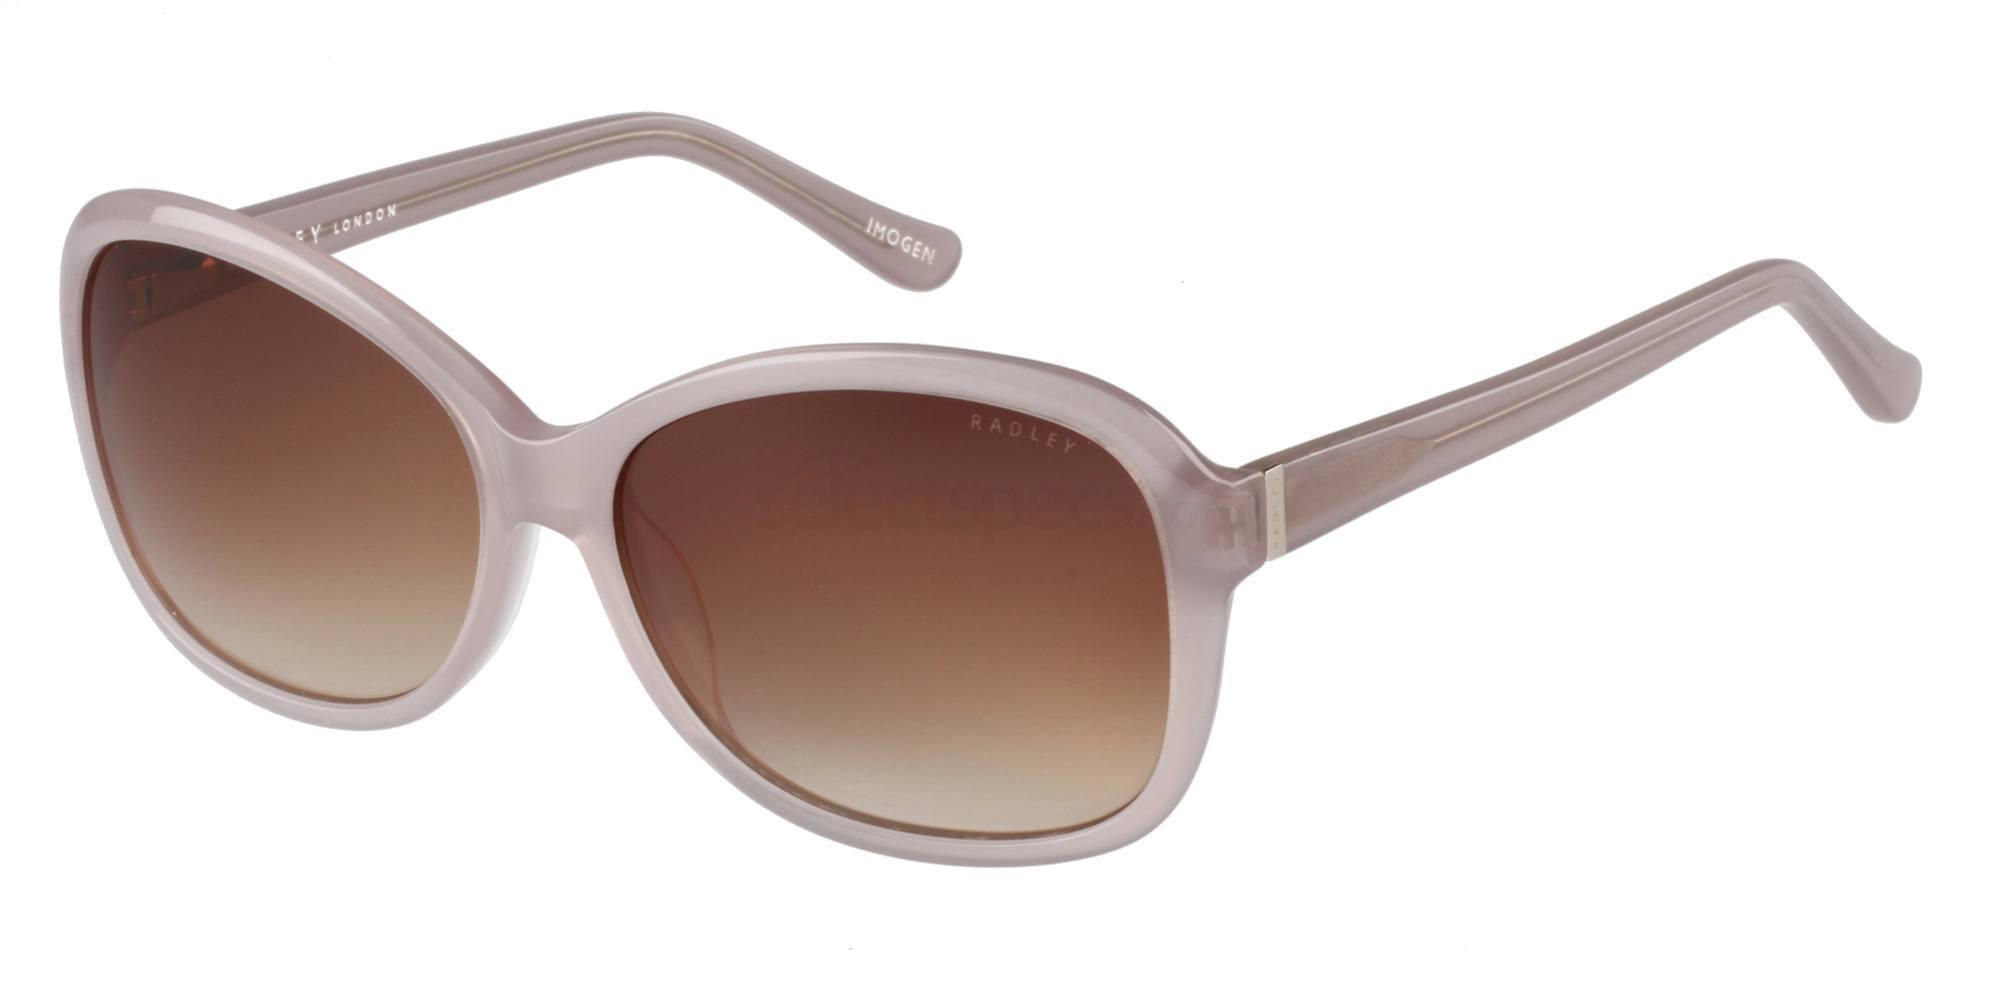 118 RDS-IMOGEN Sunglasses, Radley London